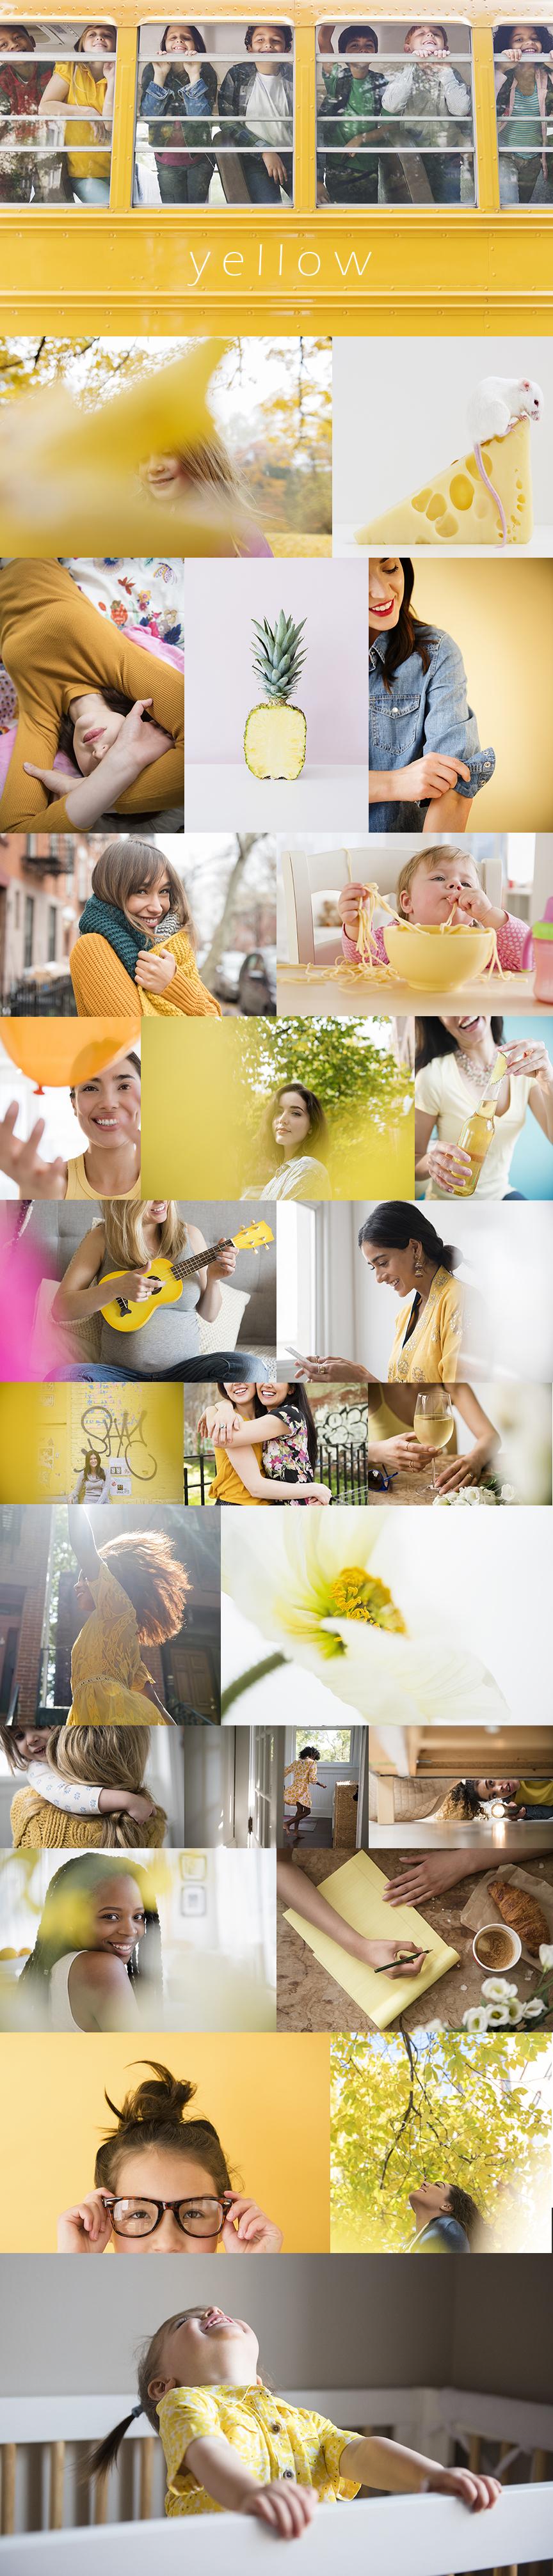 JGP colorblocking gallery yellow